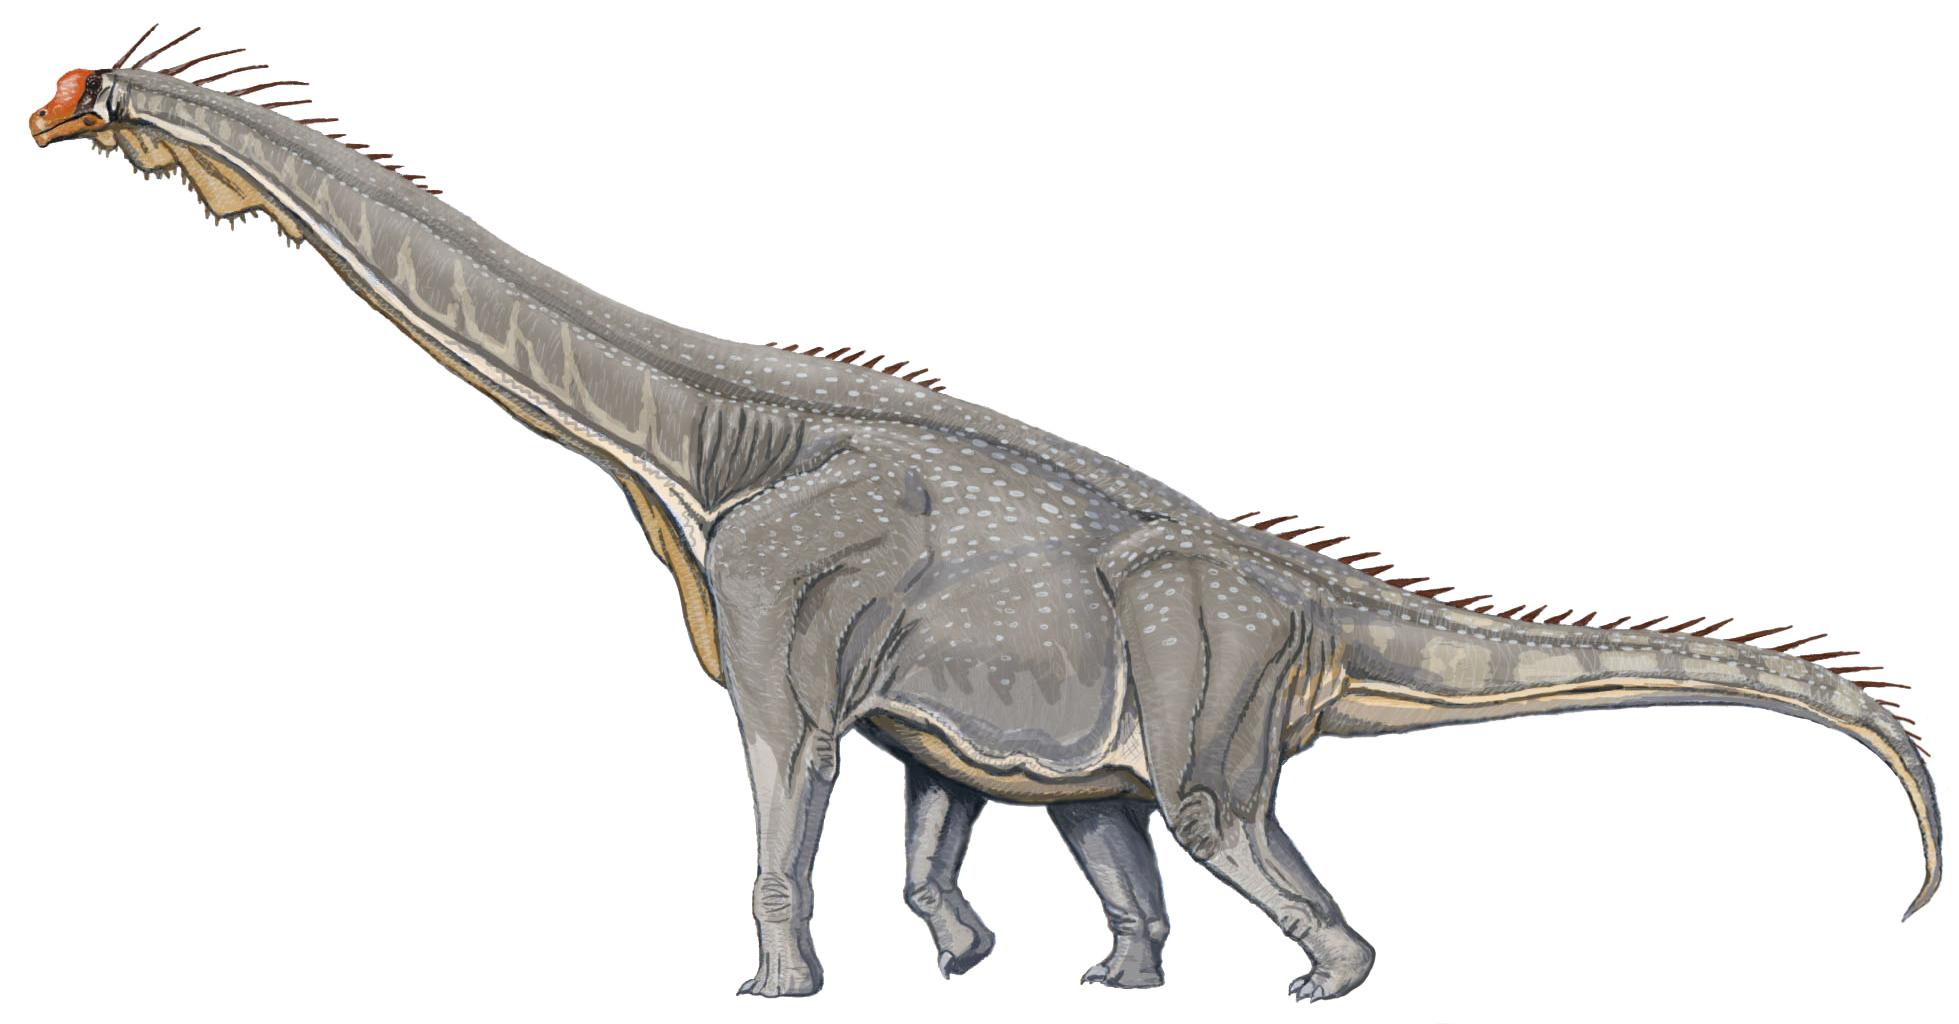 [Image: Brachiosaurus_DB.jpg]